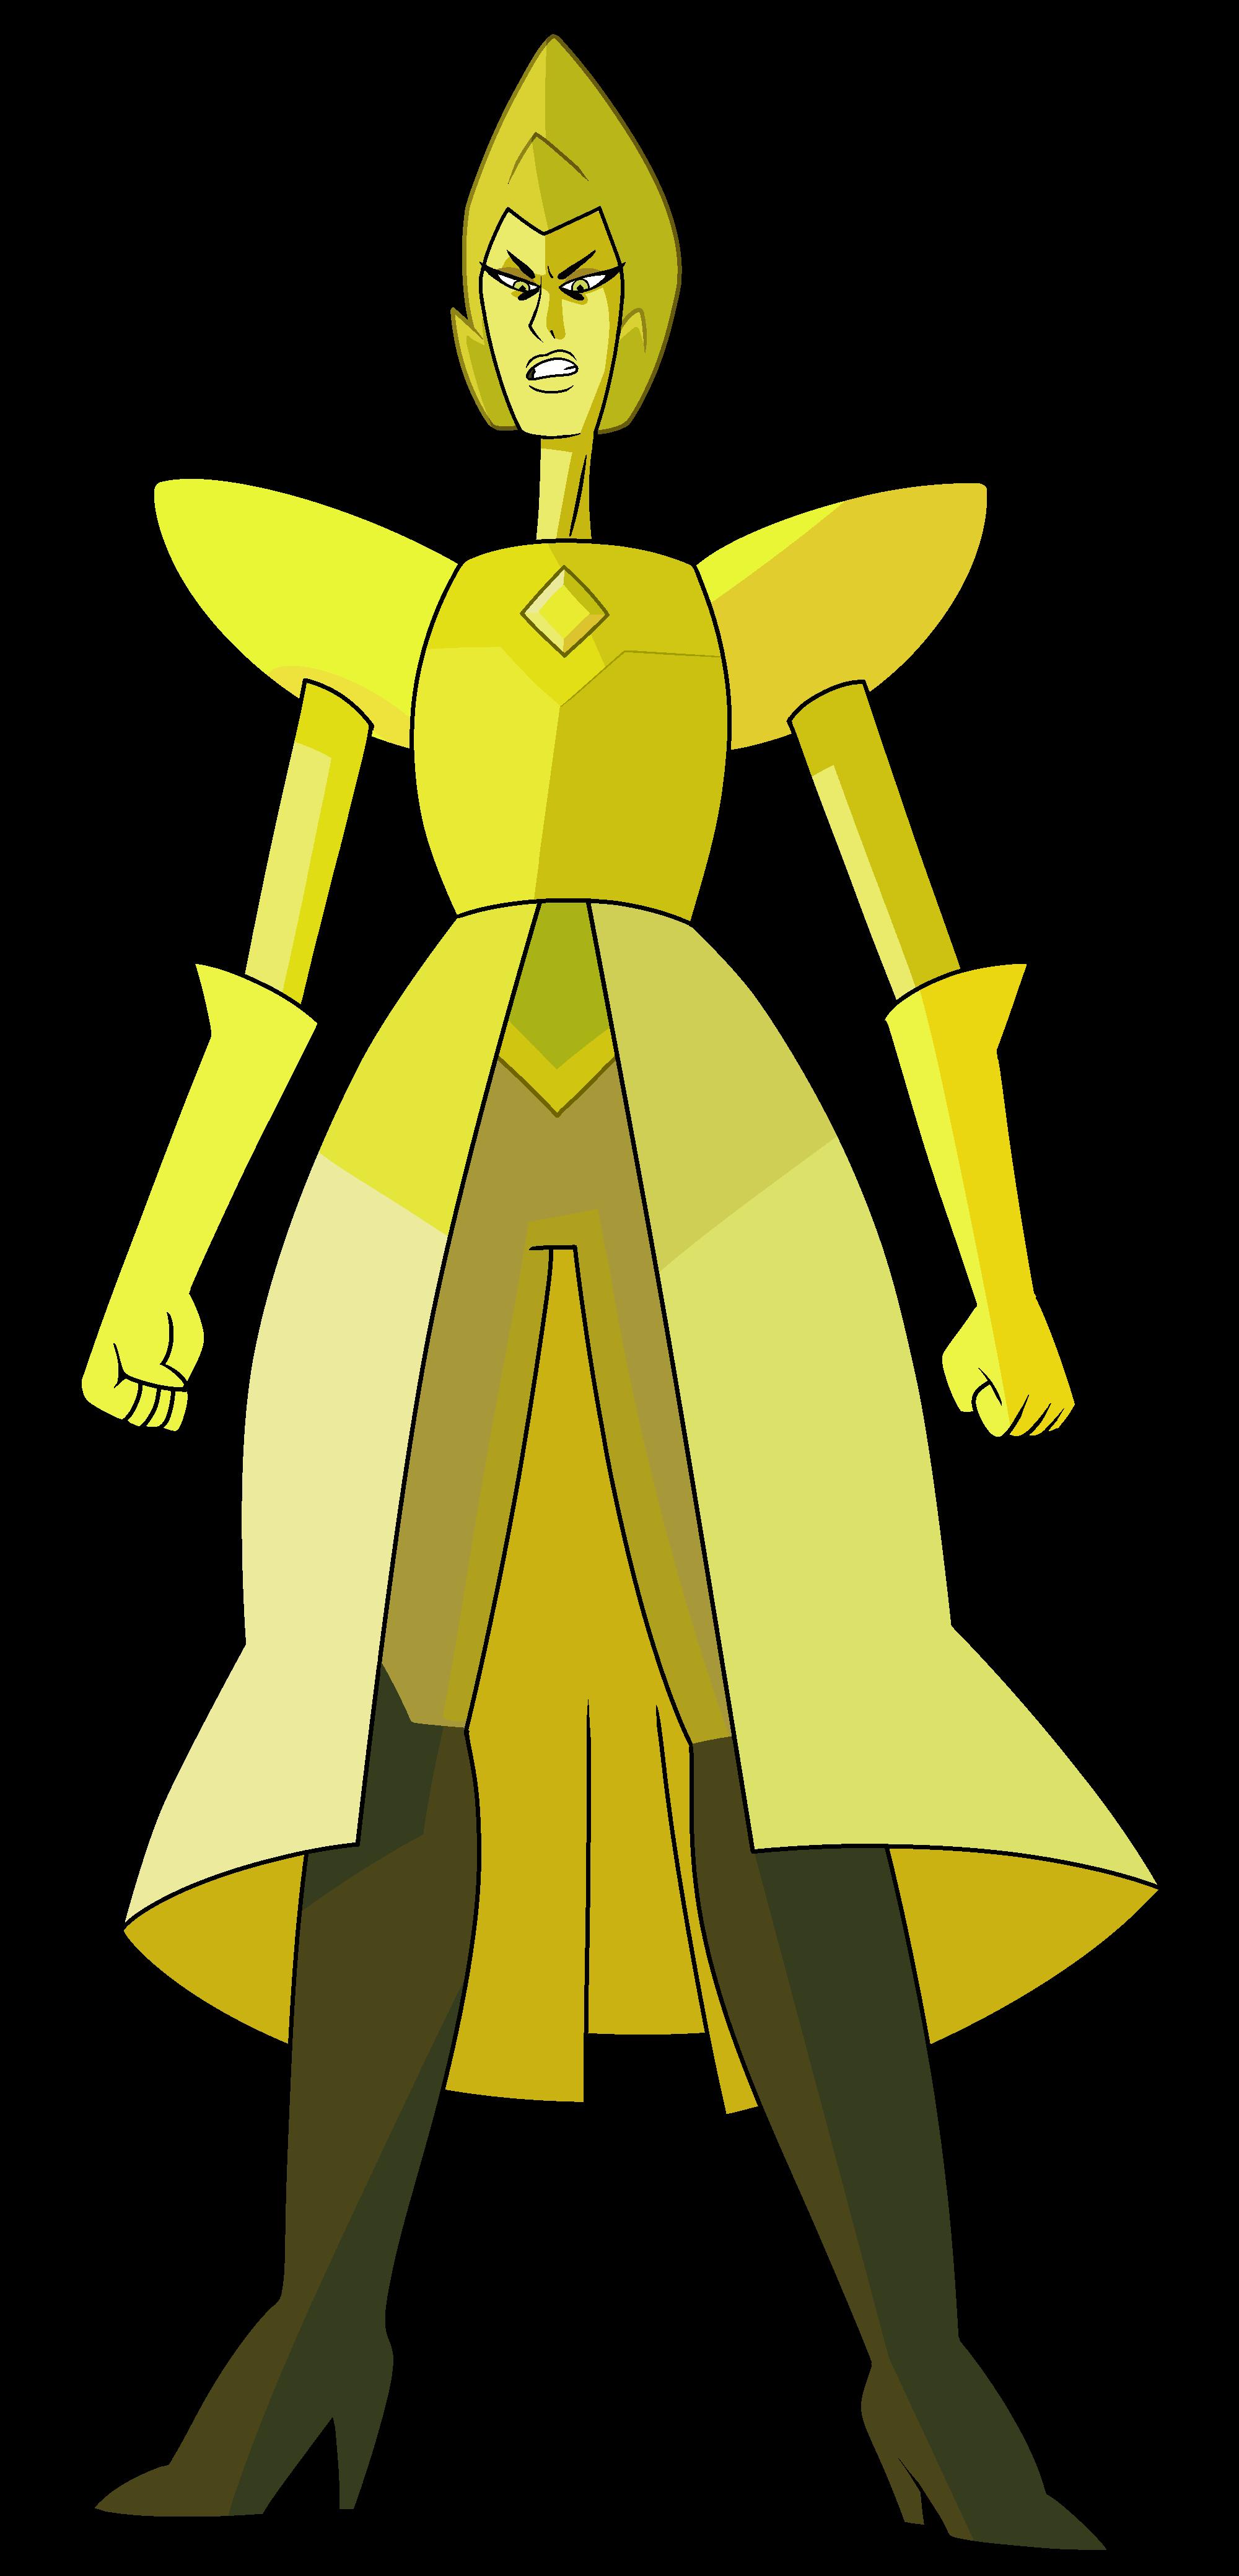 Clipart diamond yellow diamond. Stevenuniversetheoryzone wikia fandom powered